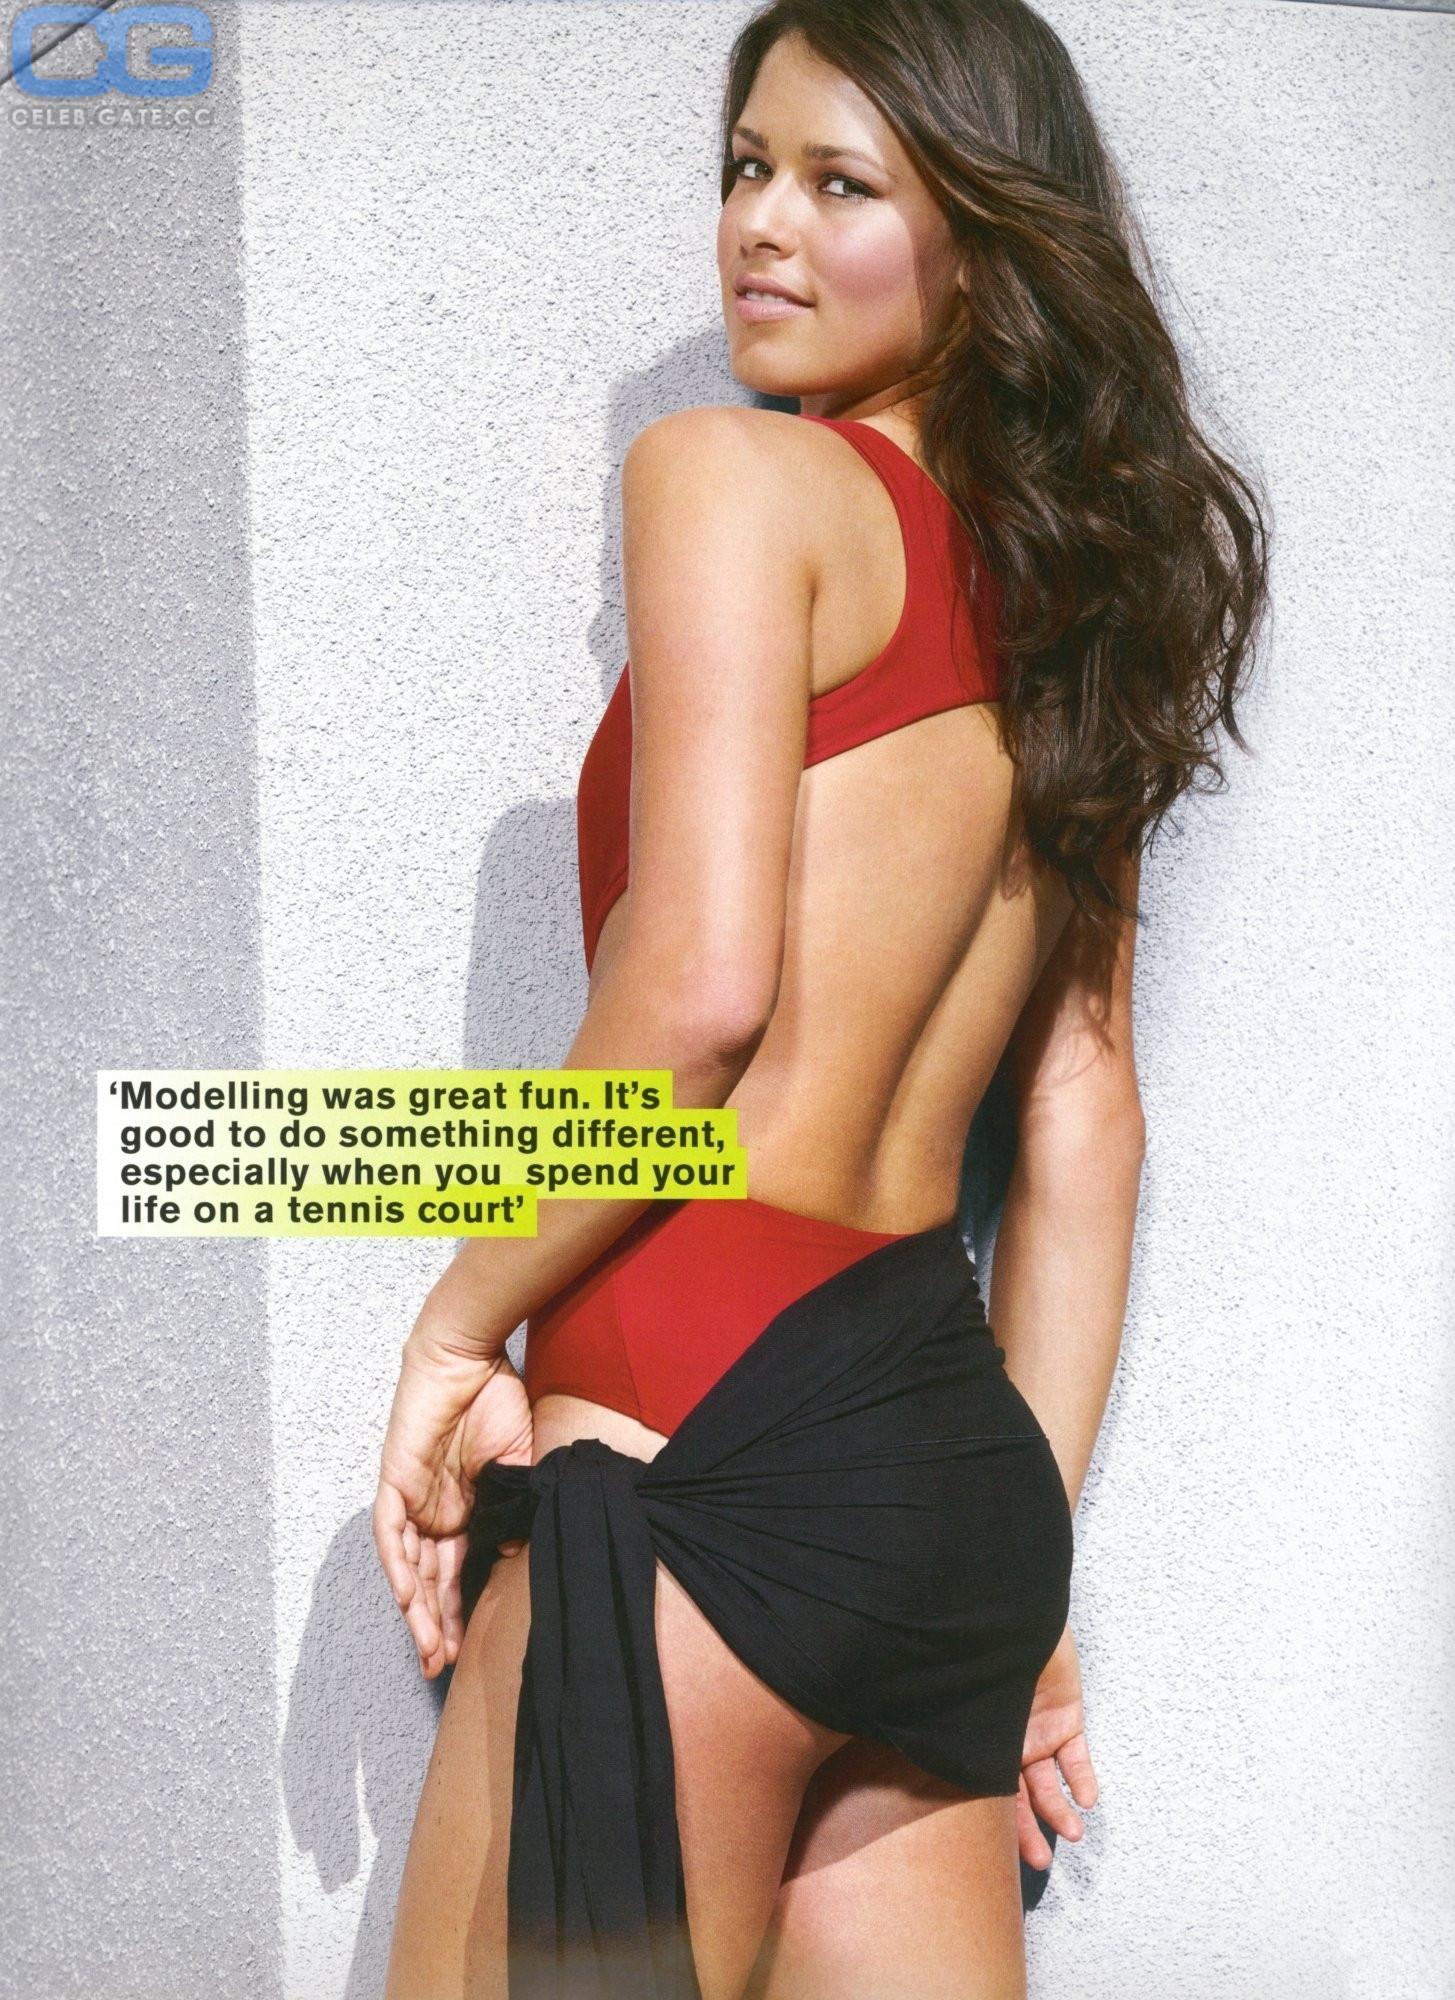 Ana Ivanovic Nude Pics ana ivanovic nude, pictures, photos, playboy, naked, topless